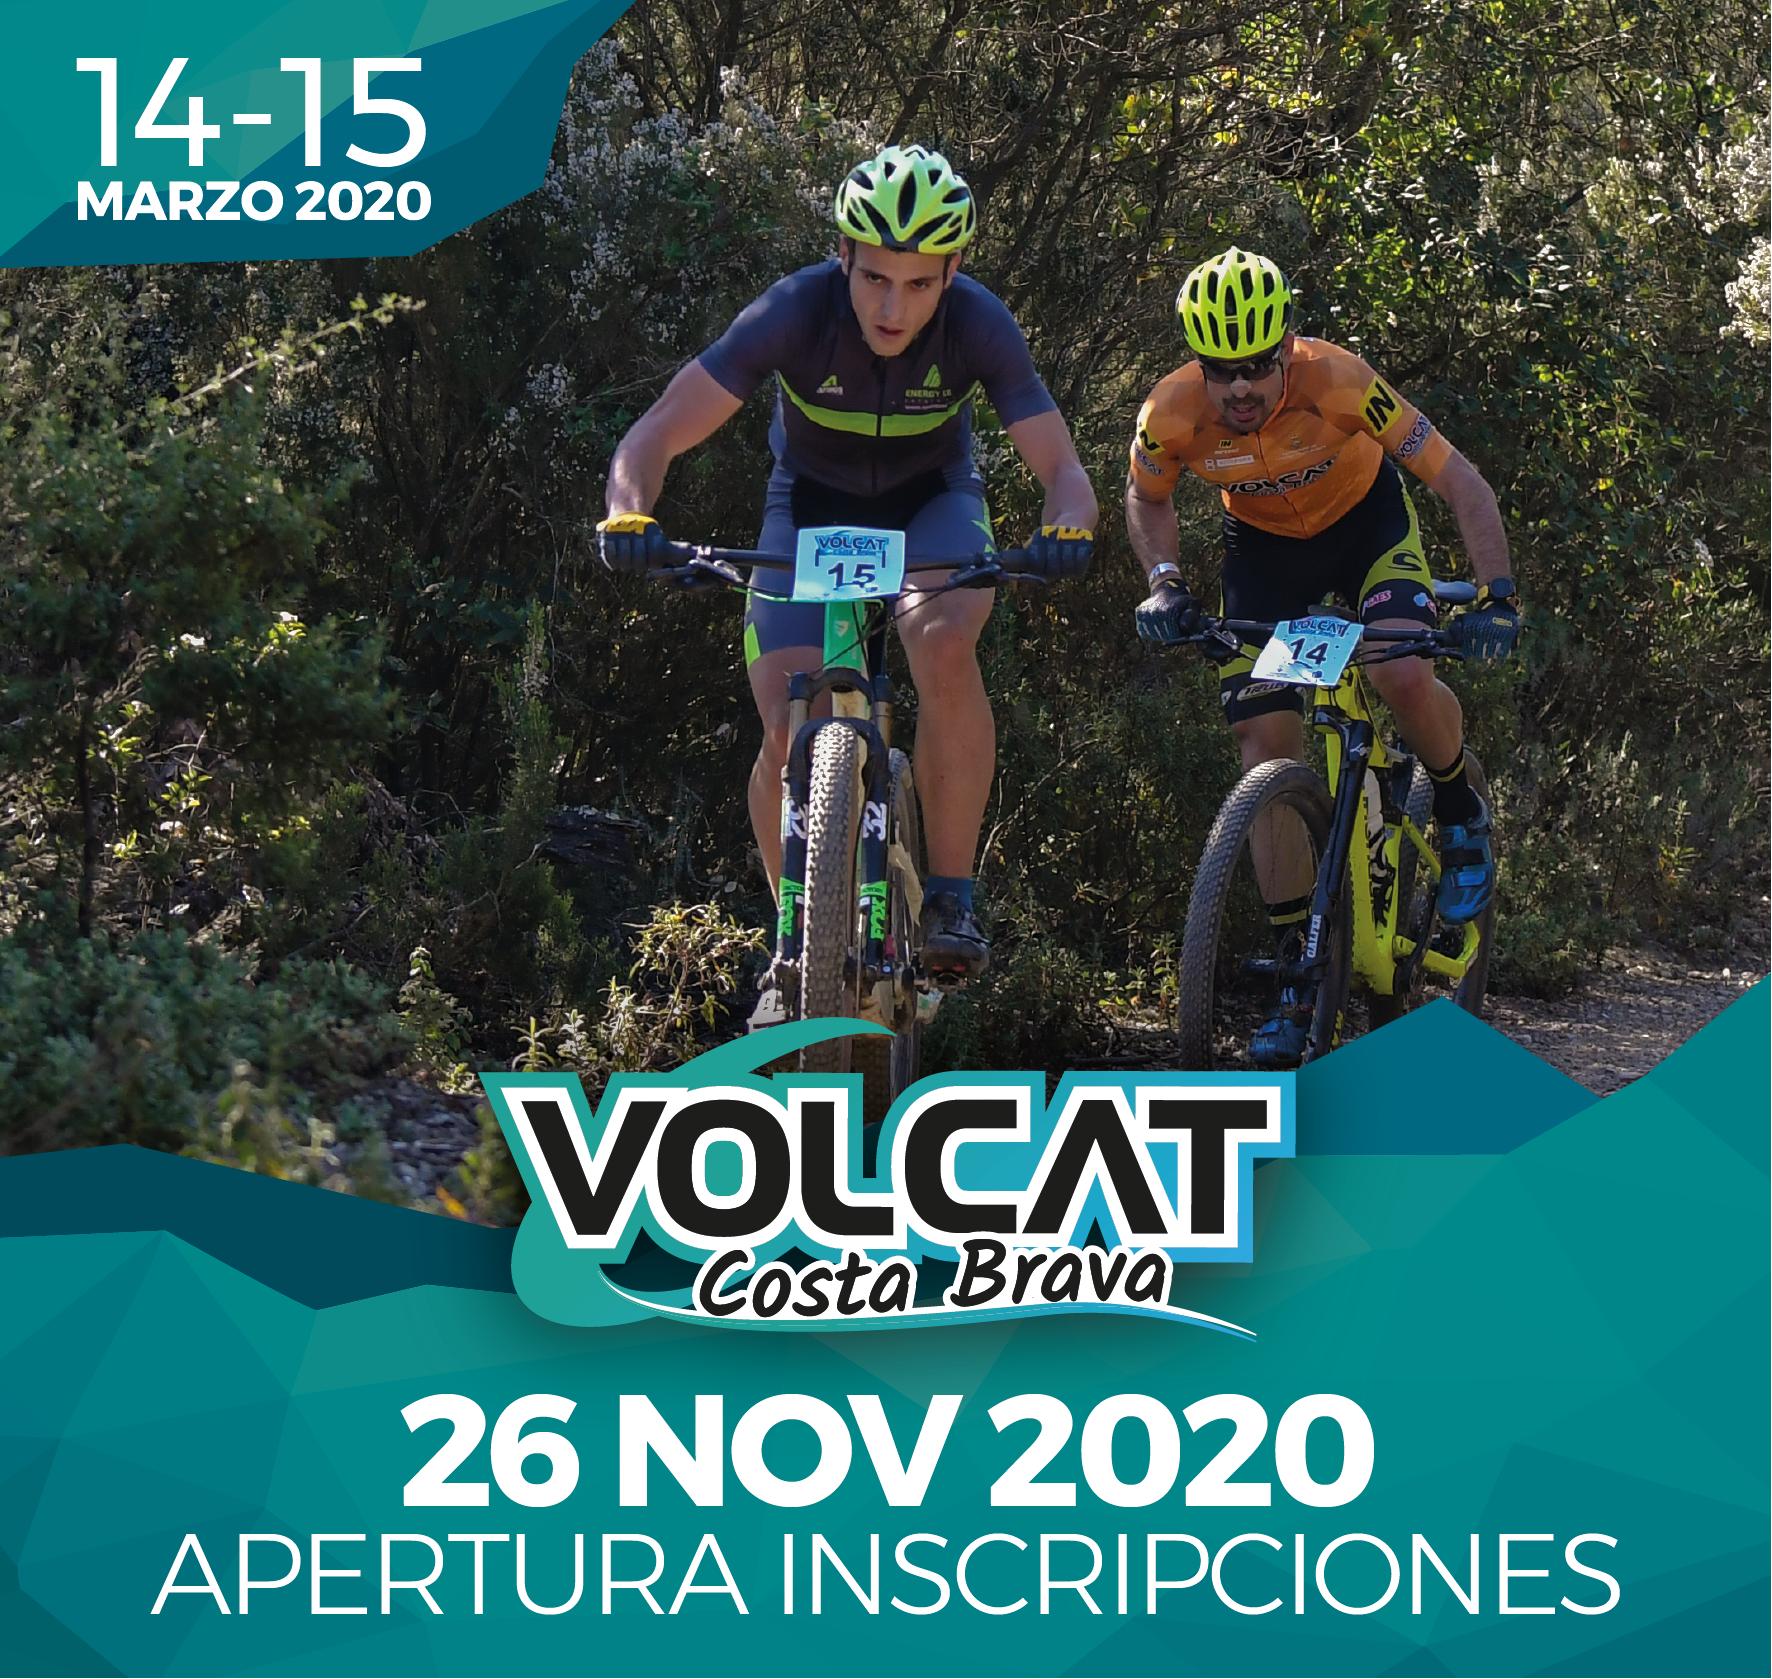 ¡VolCAT Costa Brava 2020 abre inscripciones el 26 de noviembre!